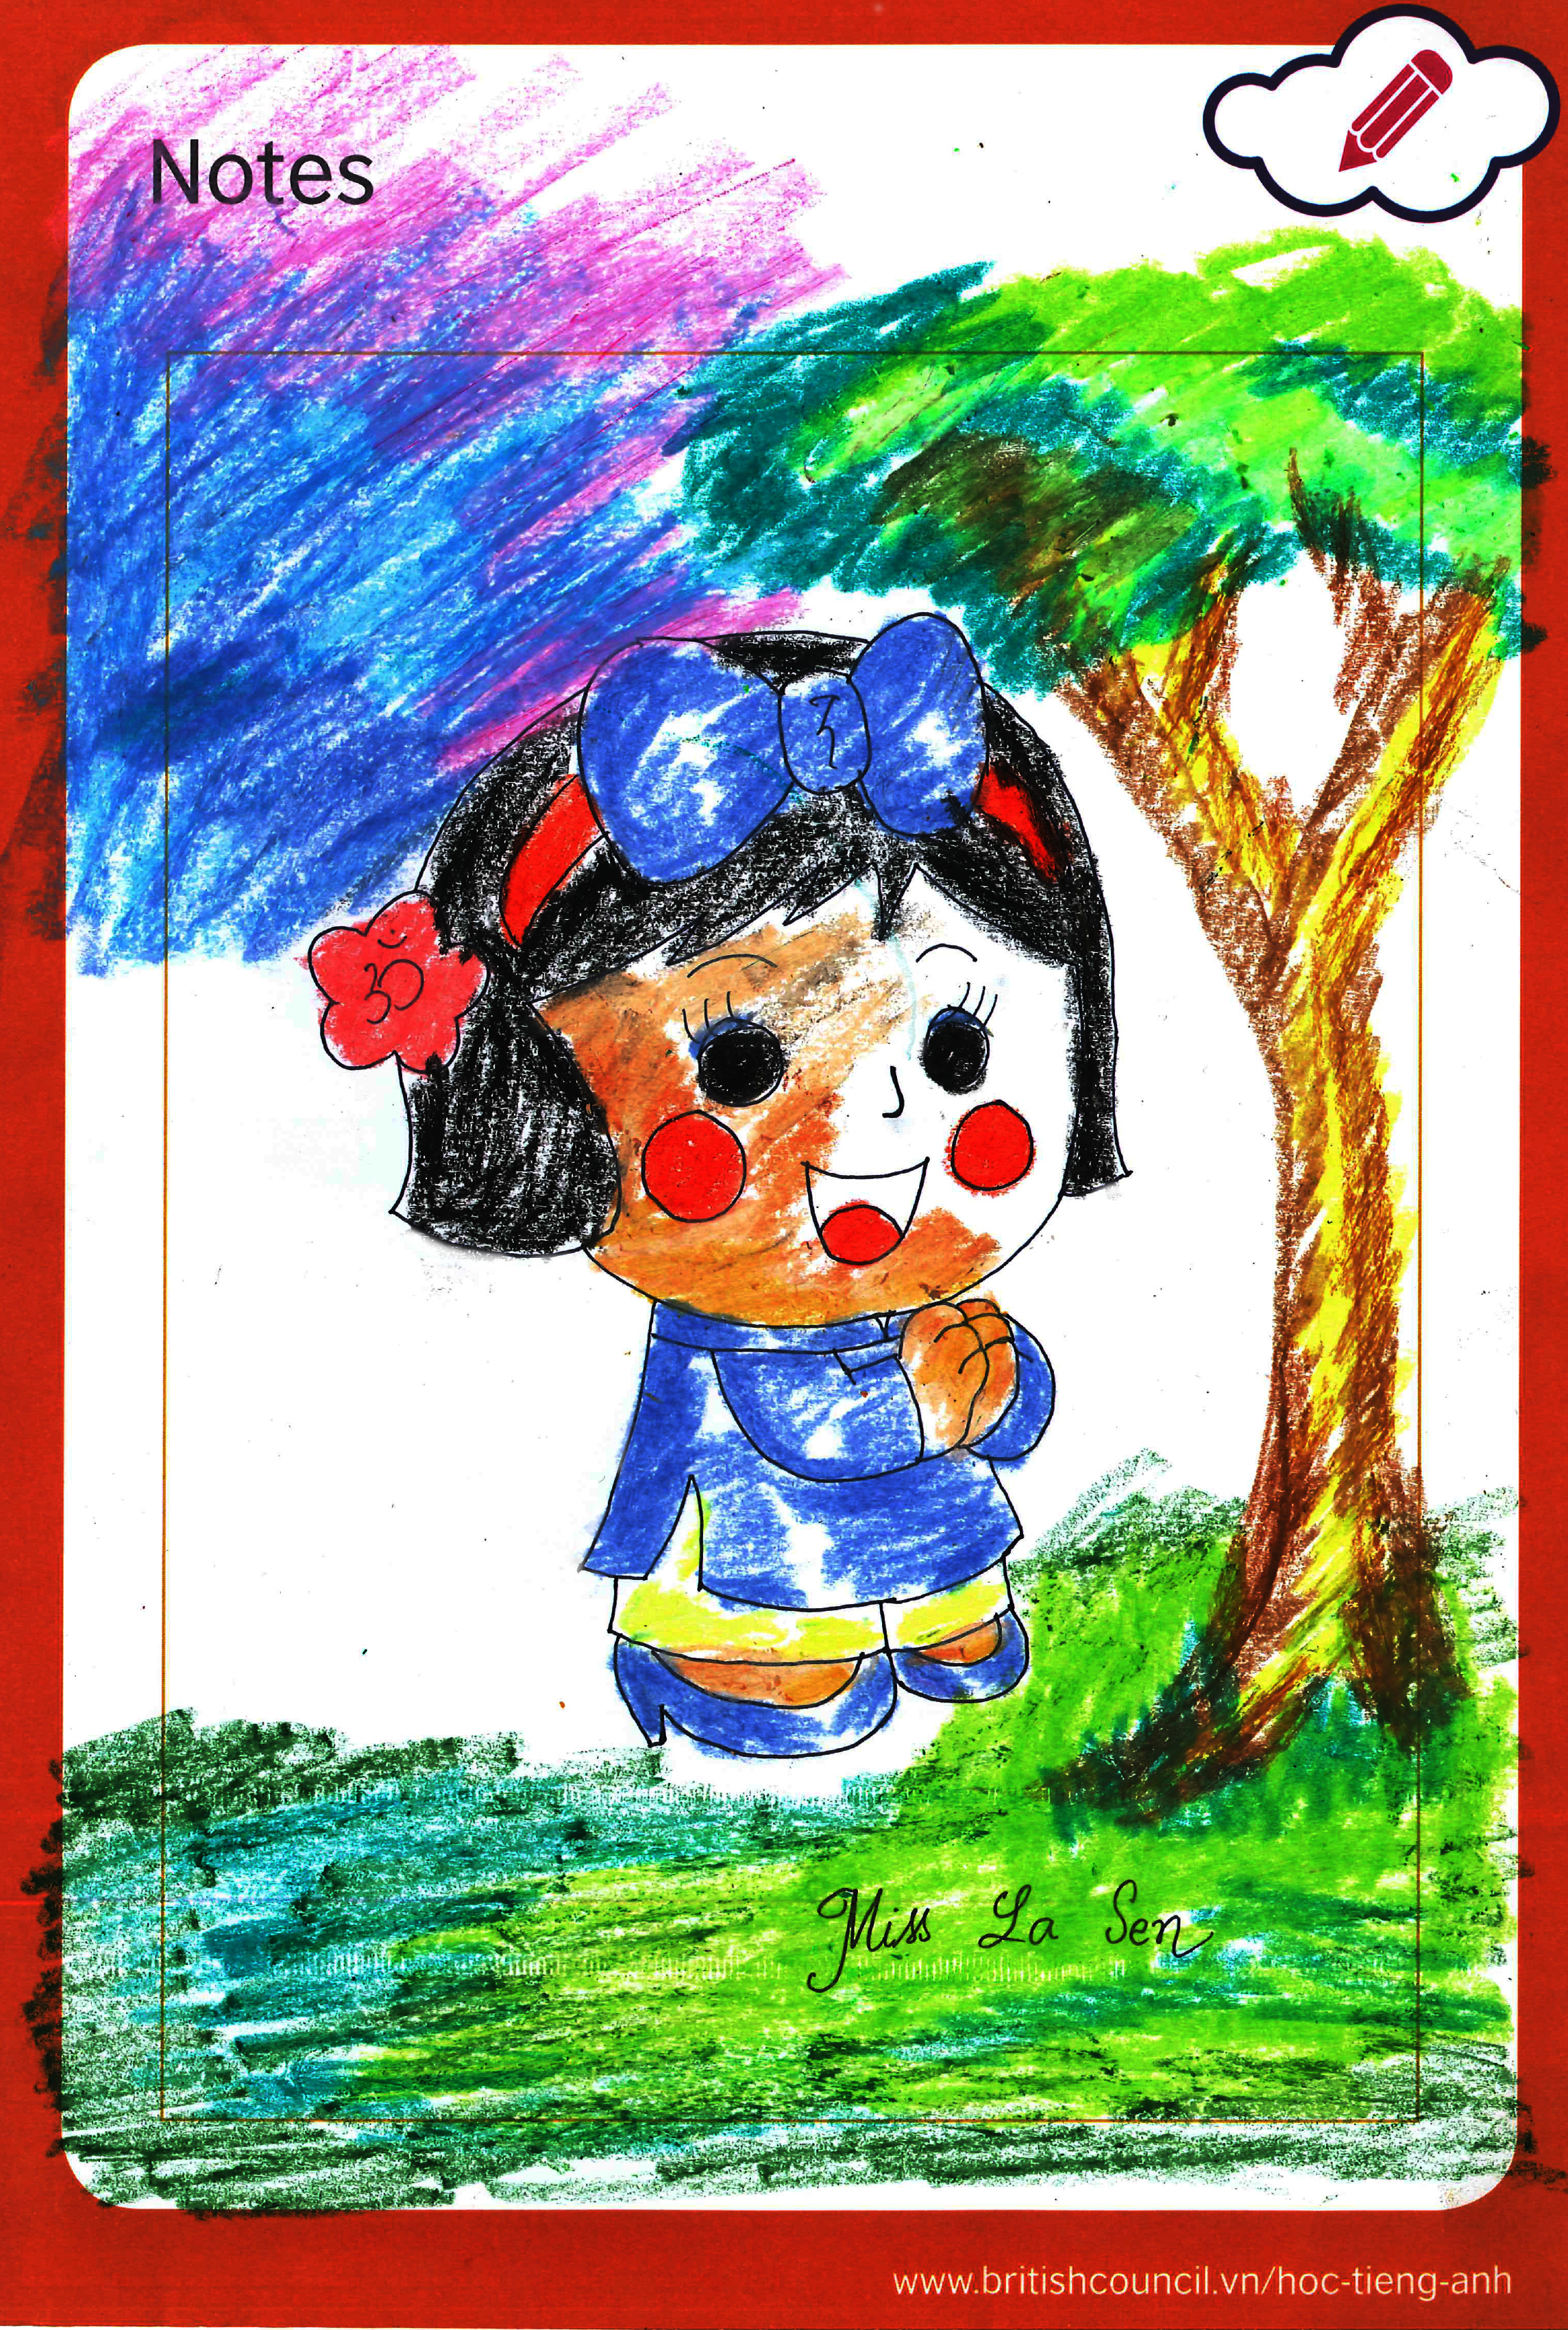 Miss La Sen lucky doll images Miss La Sen oil pastel HD wallpaper and background photos